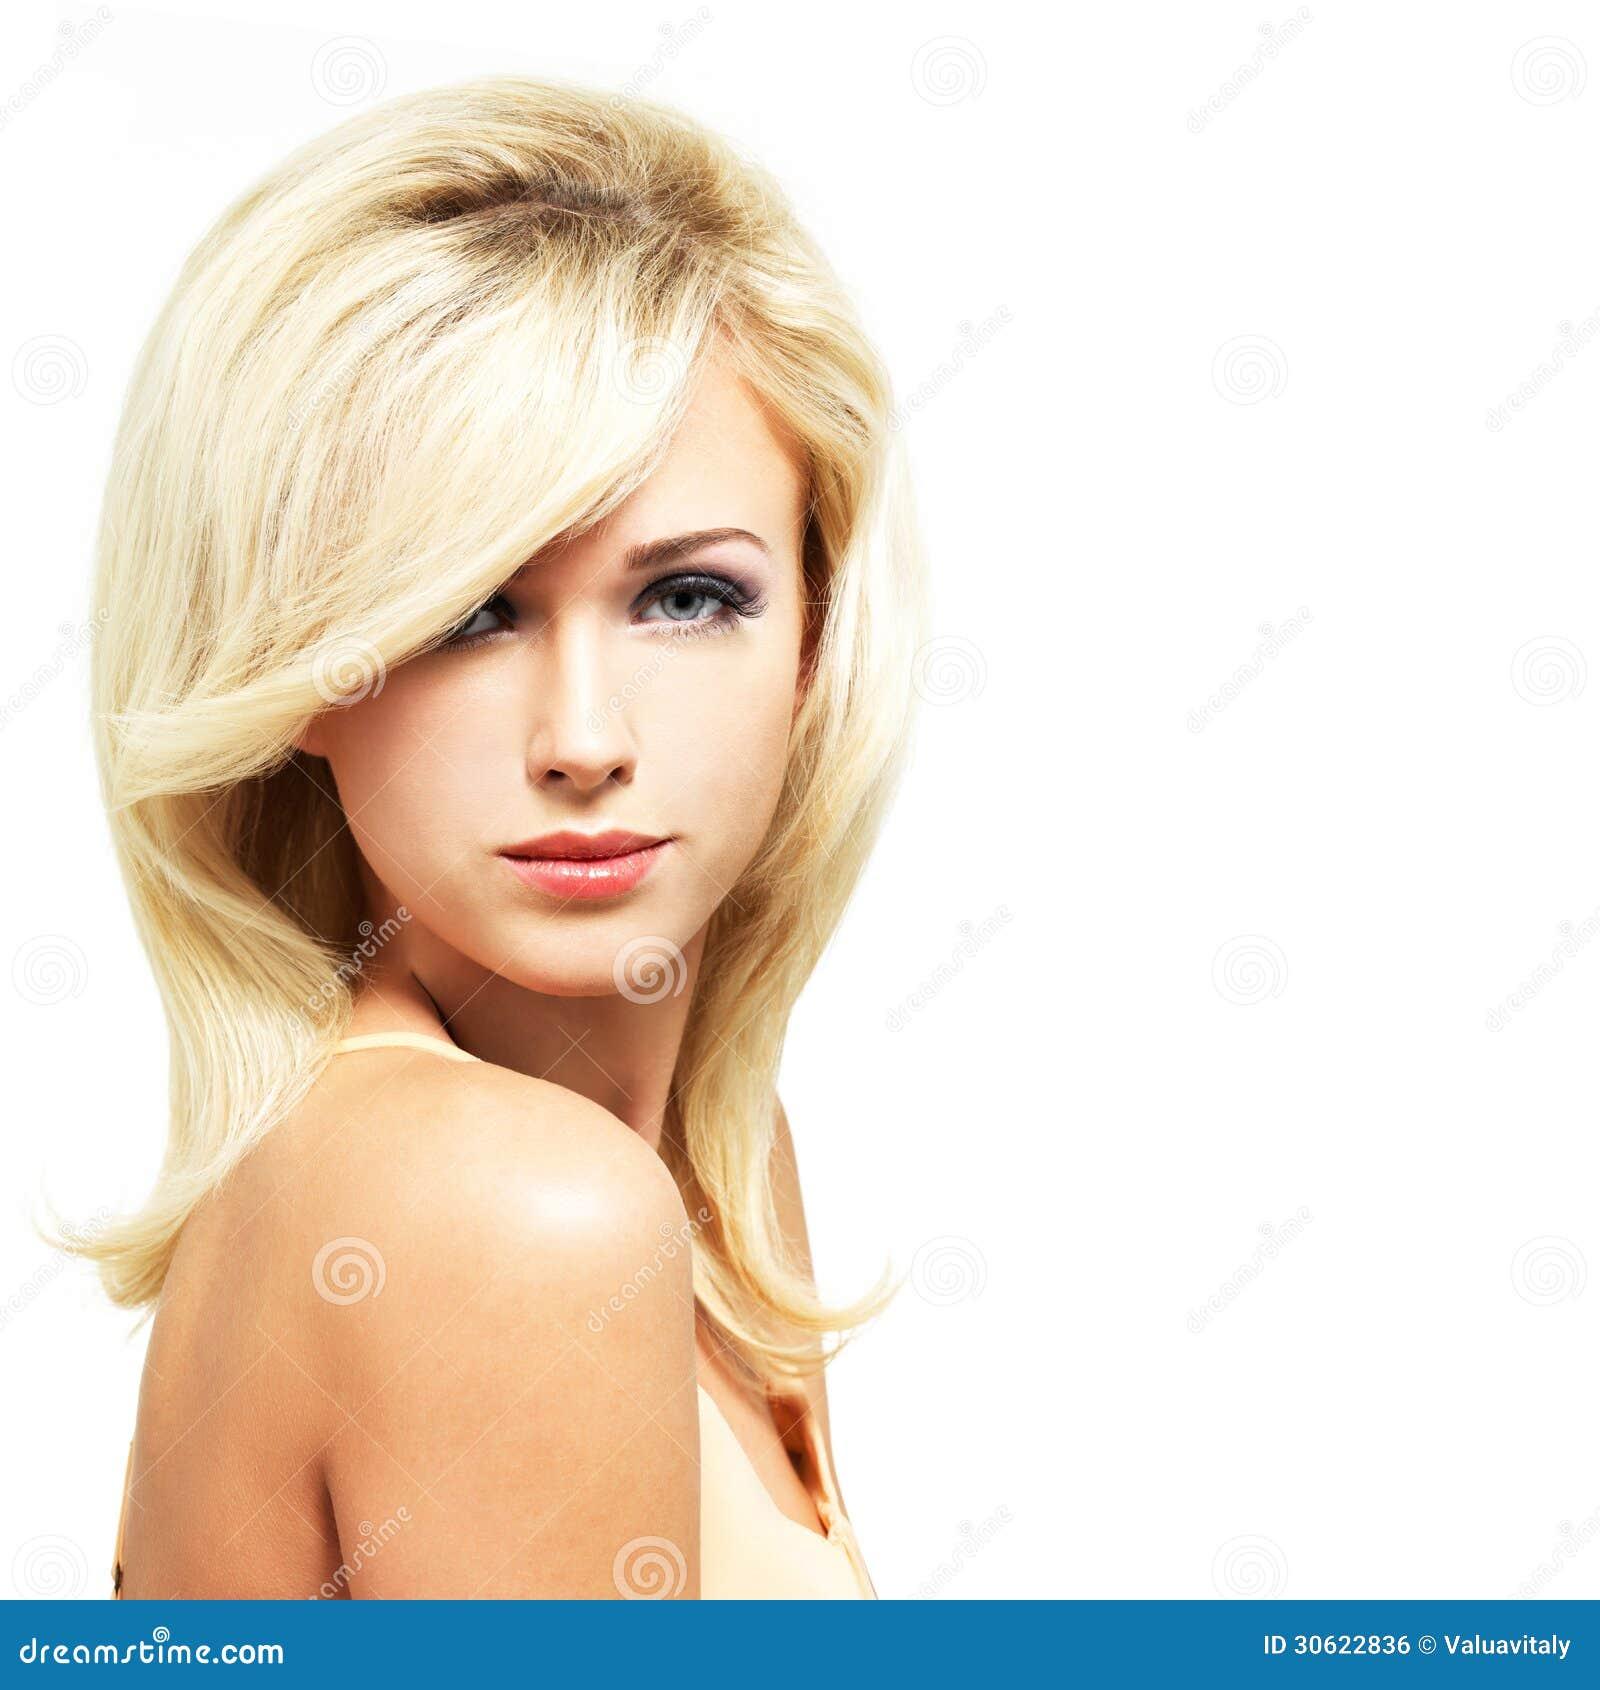 hairstyle background - photo #34